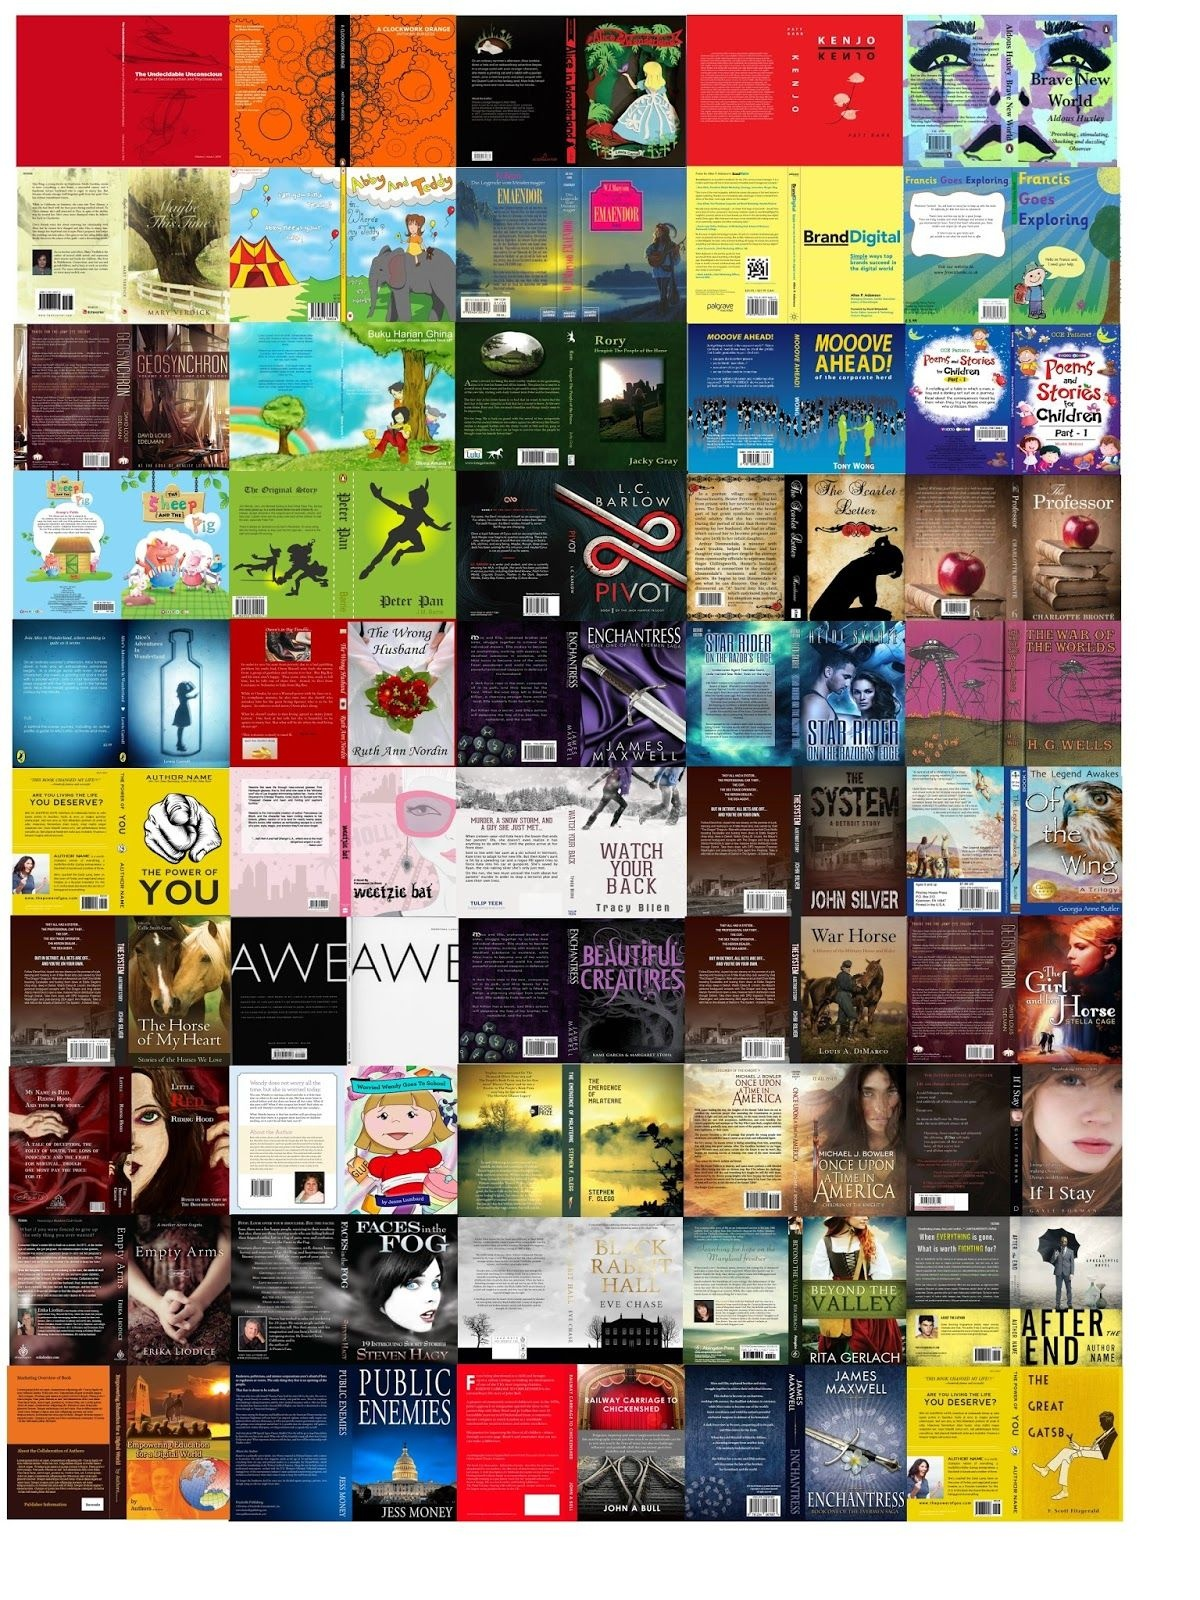 Ucreate: 50 Doll Book Covers - Printable | Dollhouse | Dolls, Doll - Free Printable Miniature Book Covers